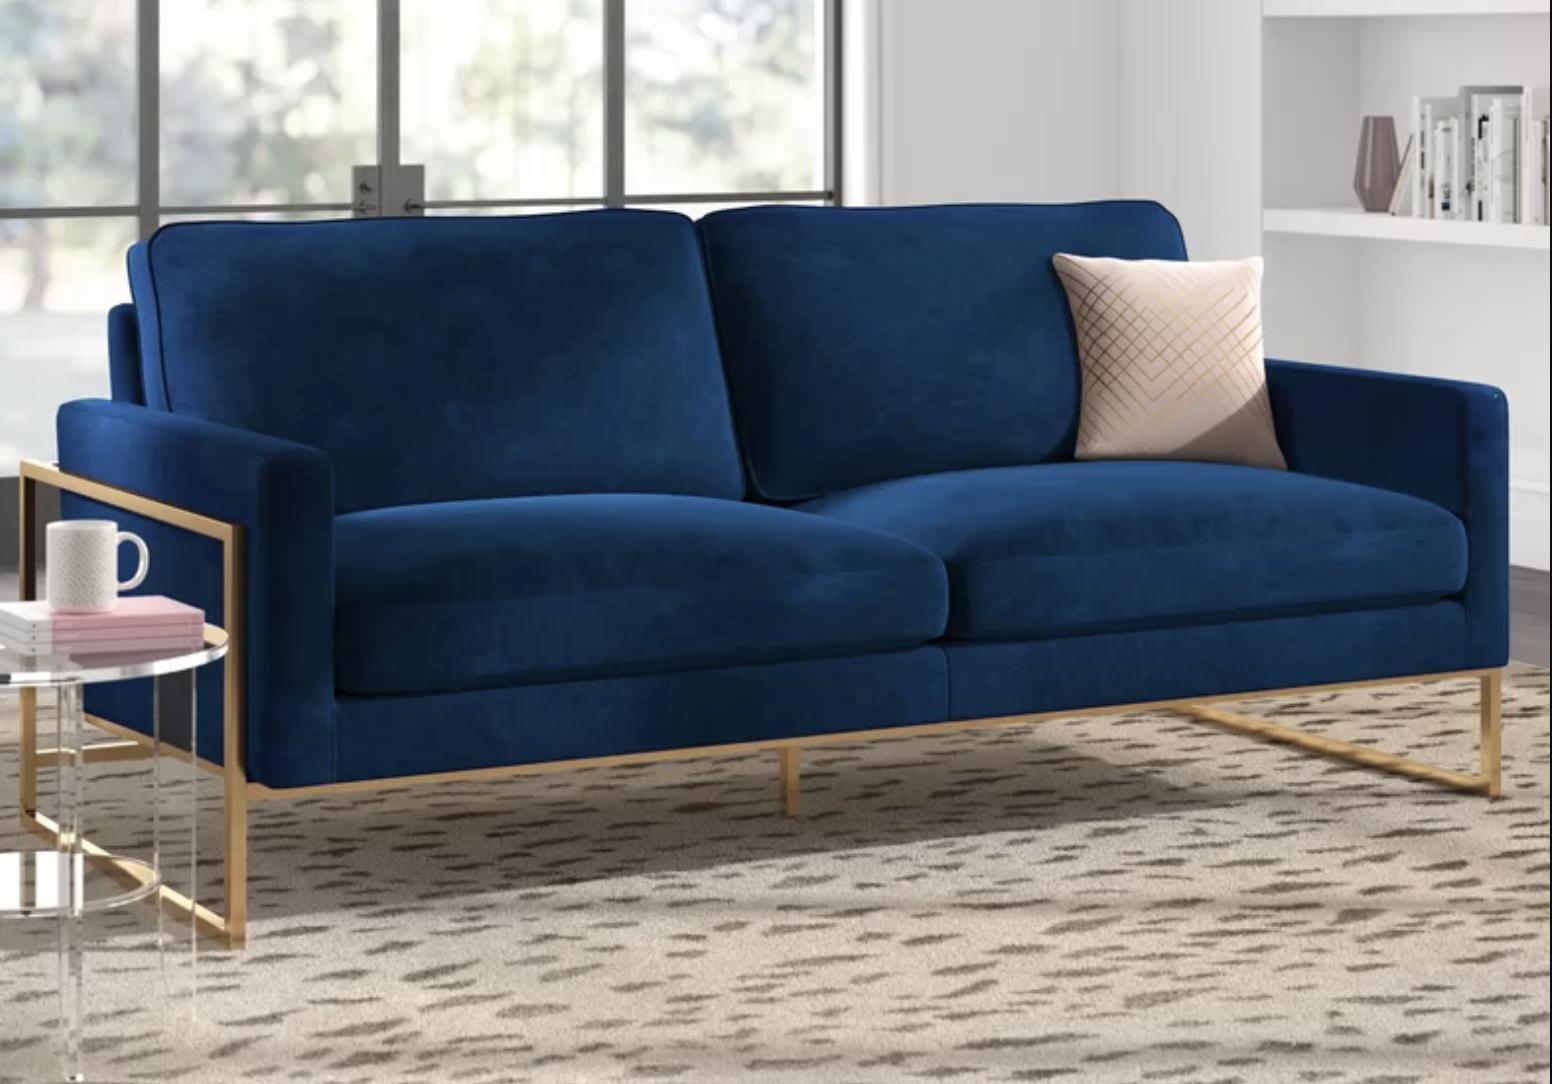 preston-blue-sofa